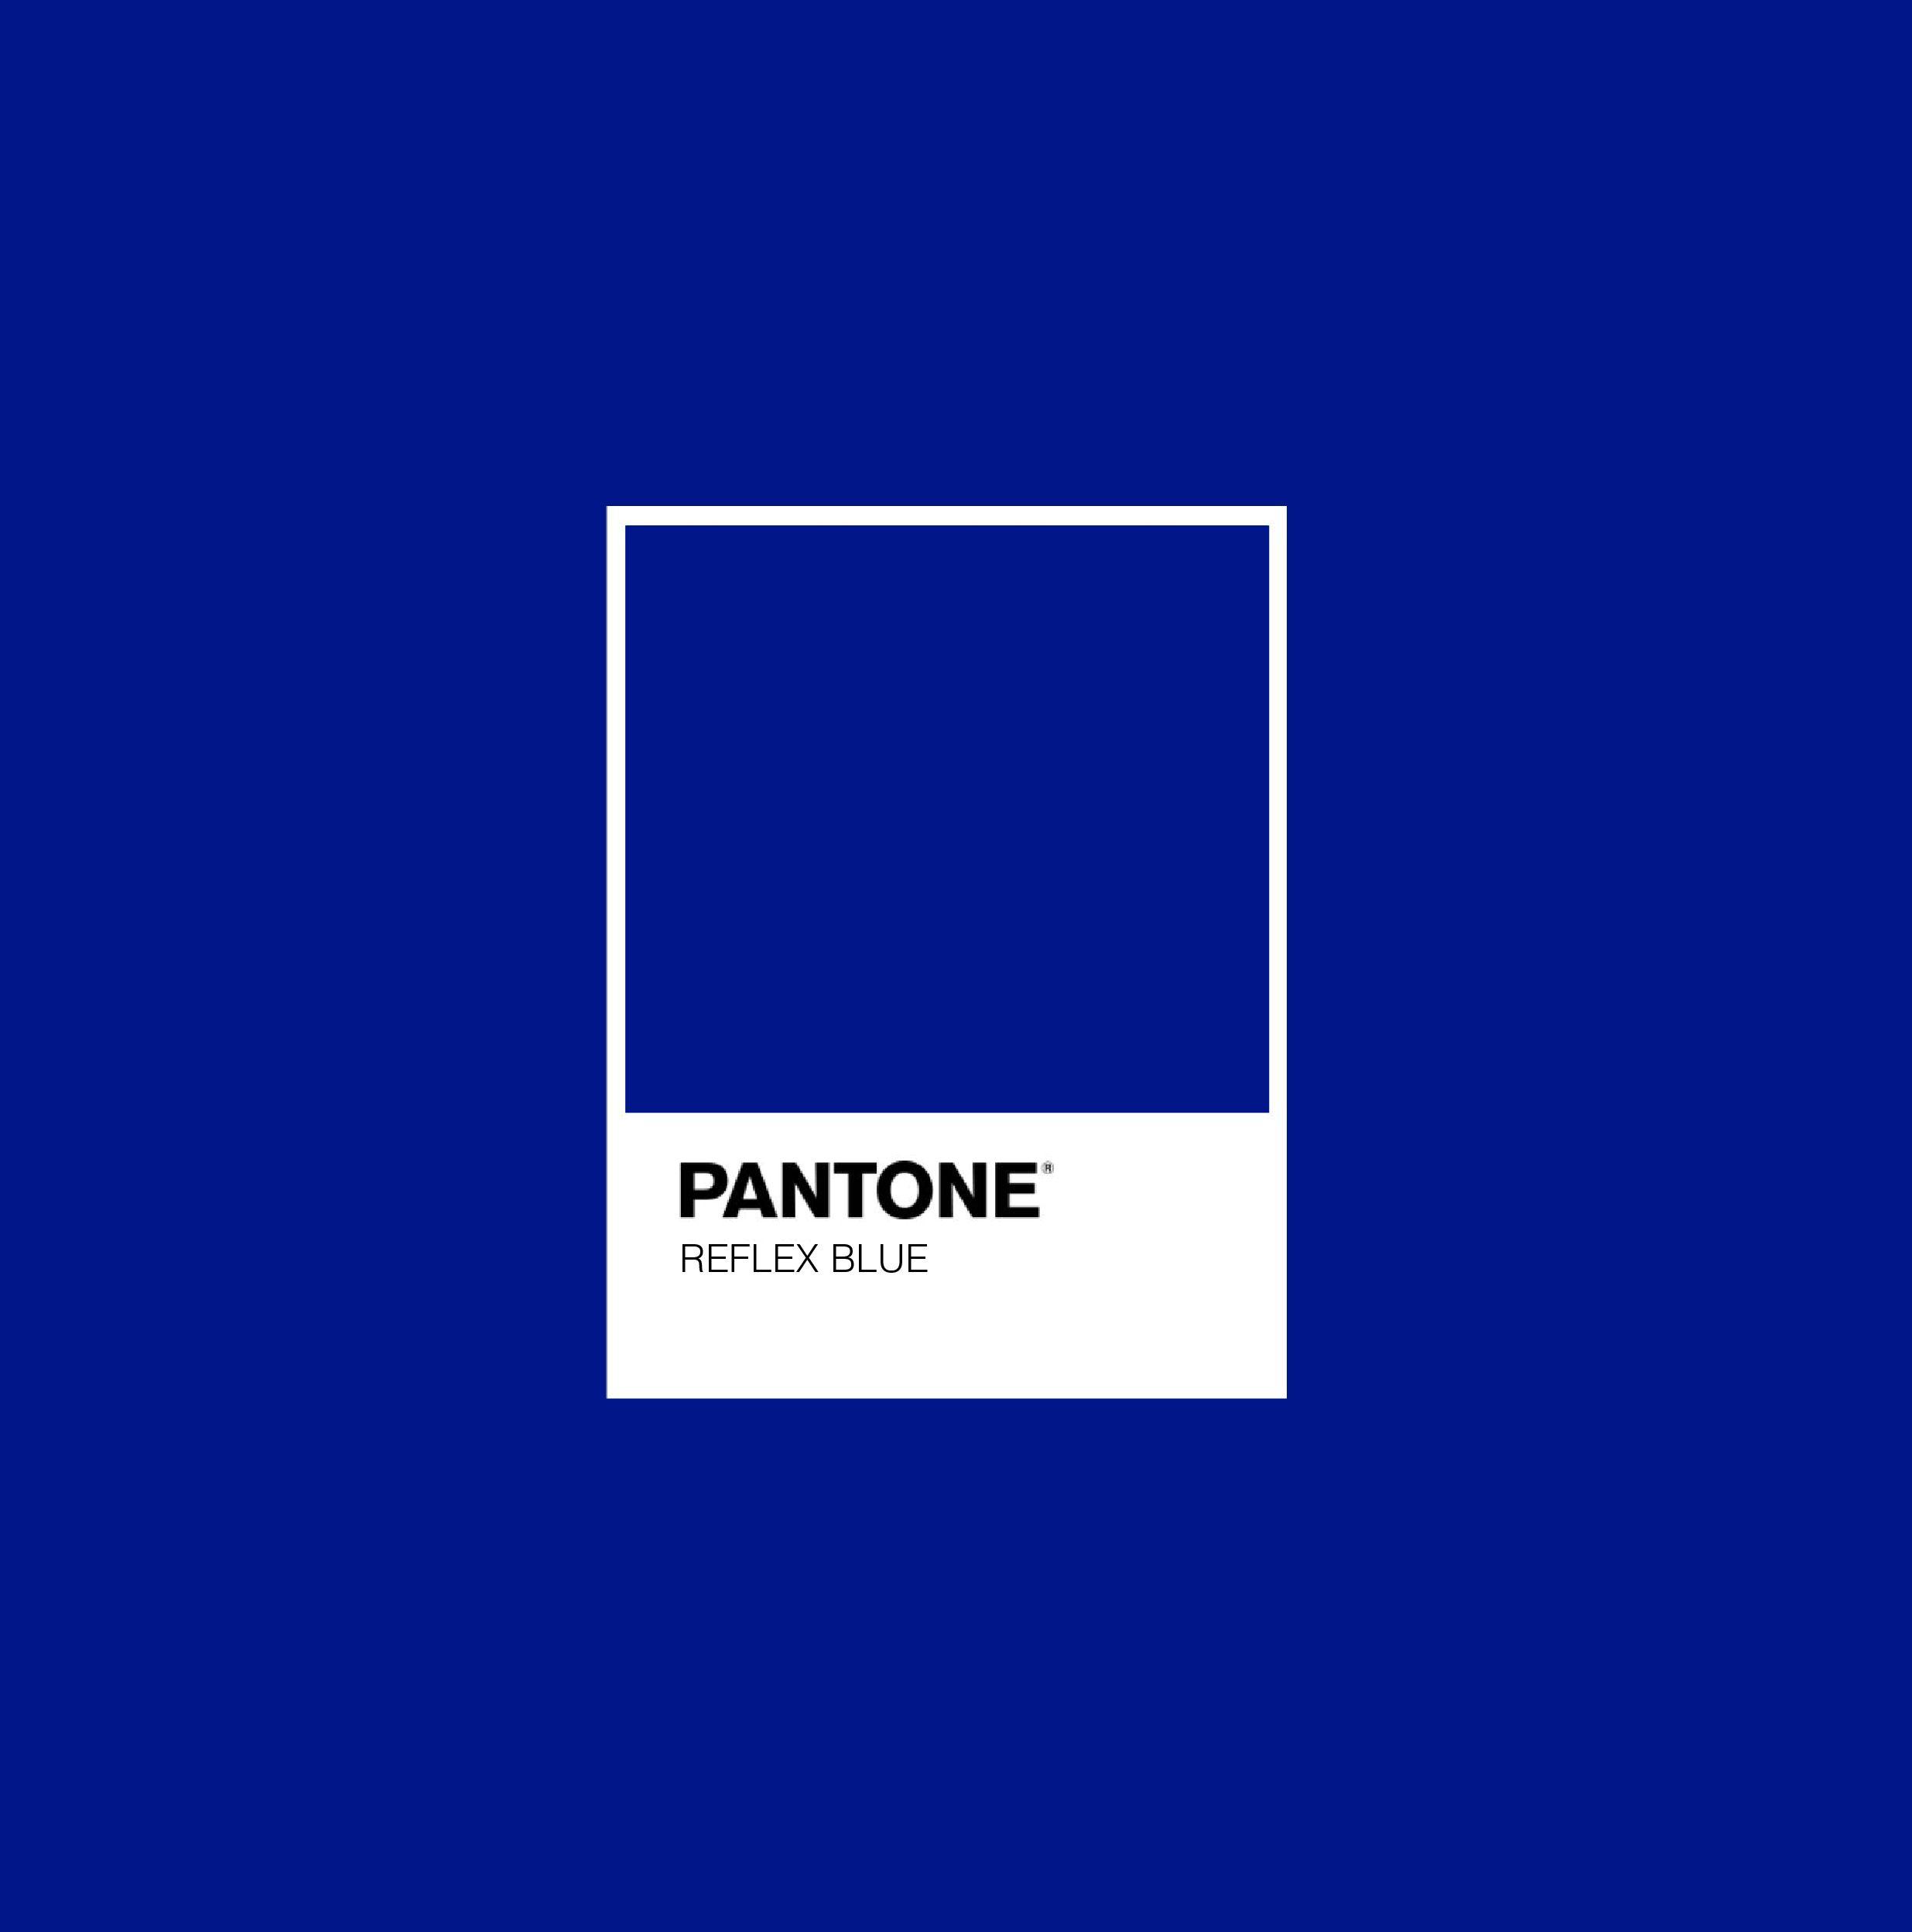 rusticbrown pantone luxurydotcom pantone in 2019